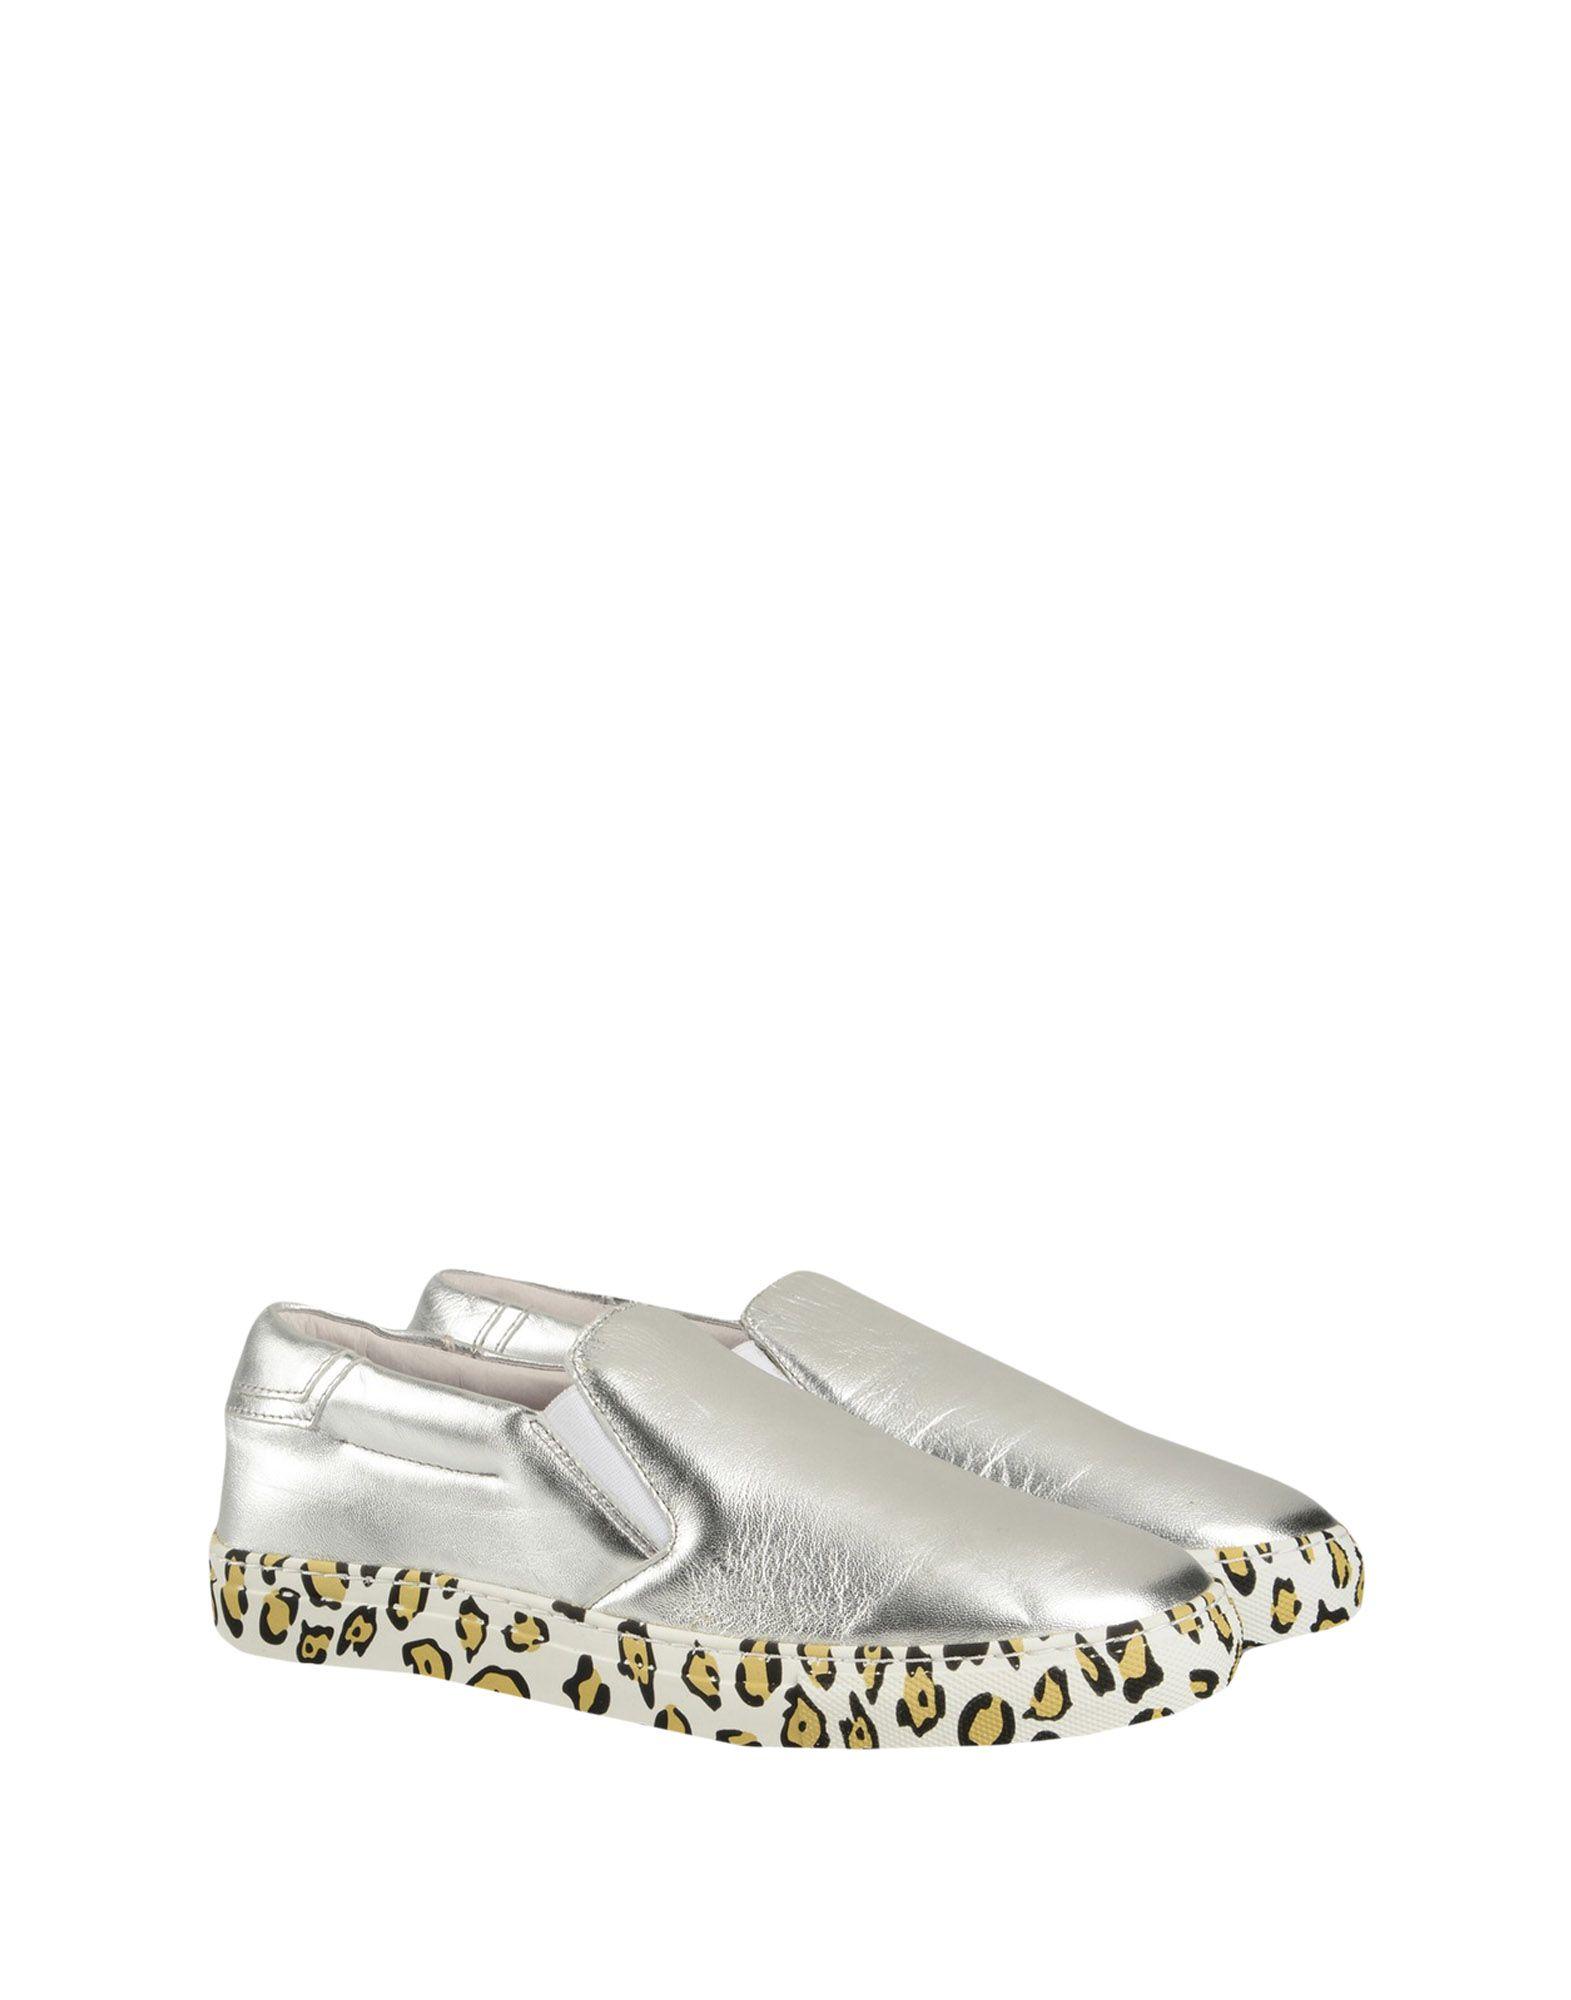 Stilvolle billige Schuhe Just Cavalli 11394940TP Sneakers Damen  11394940TP Cavalli 37245c